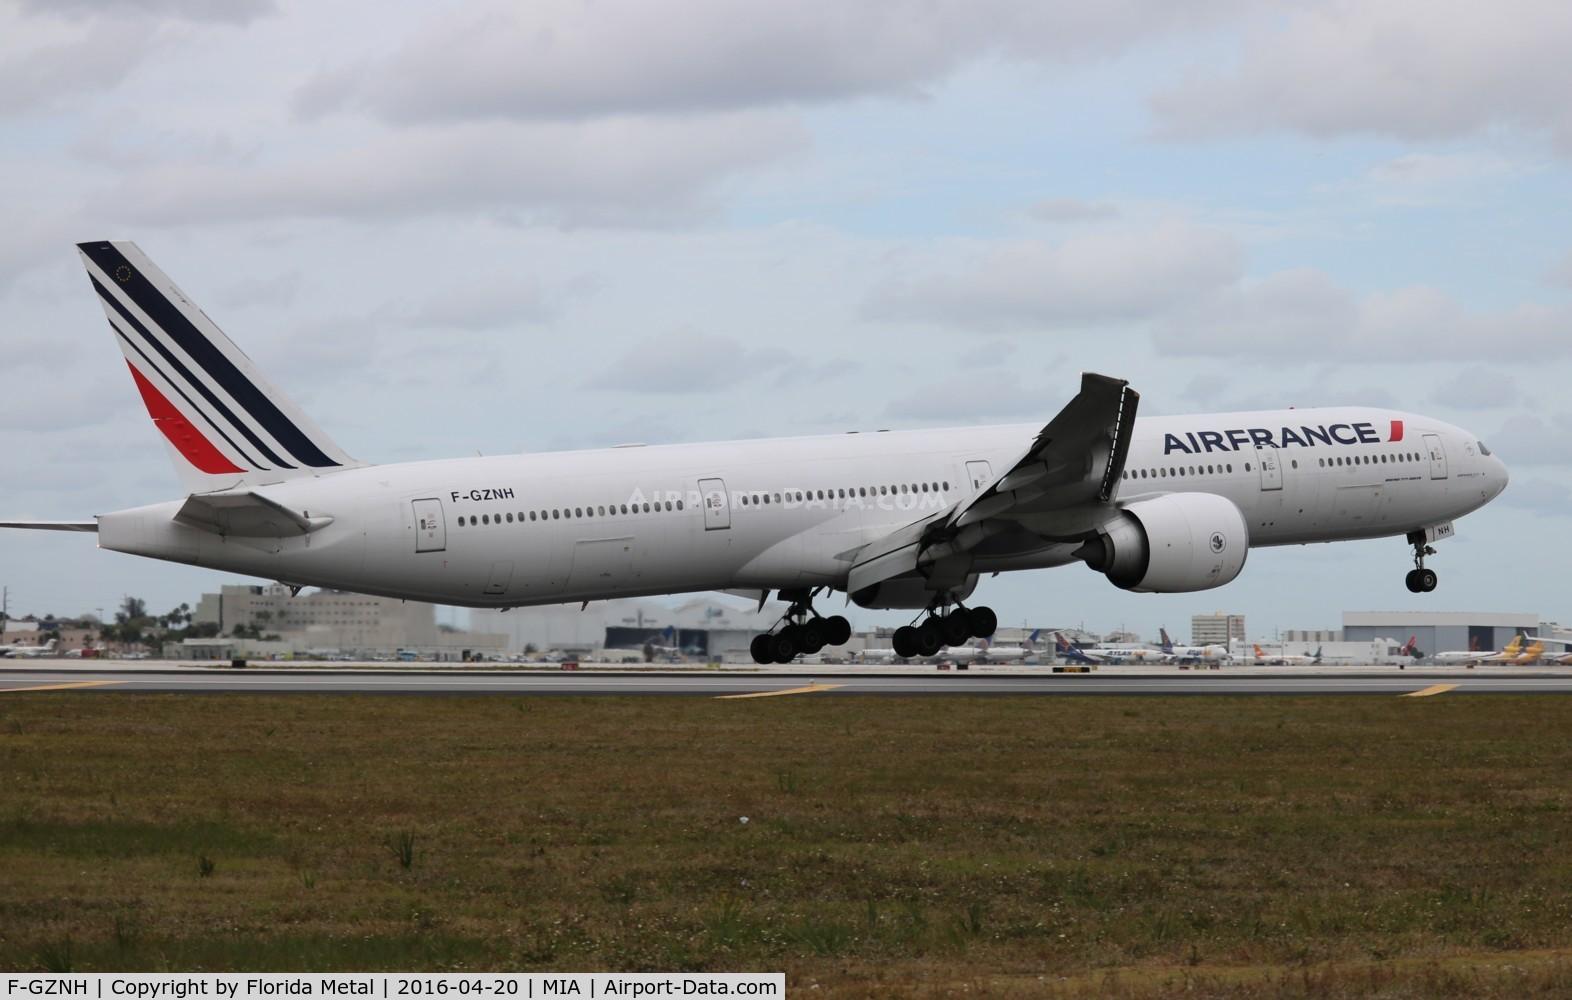 F-GZNH, 2010 Boeing 777-328/ER C/N 35544, Air France